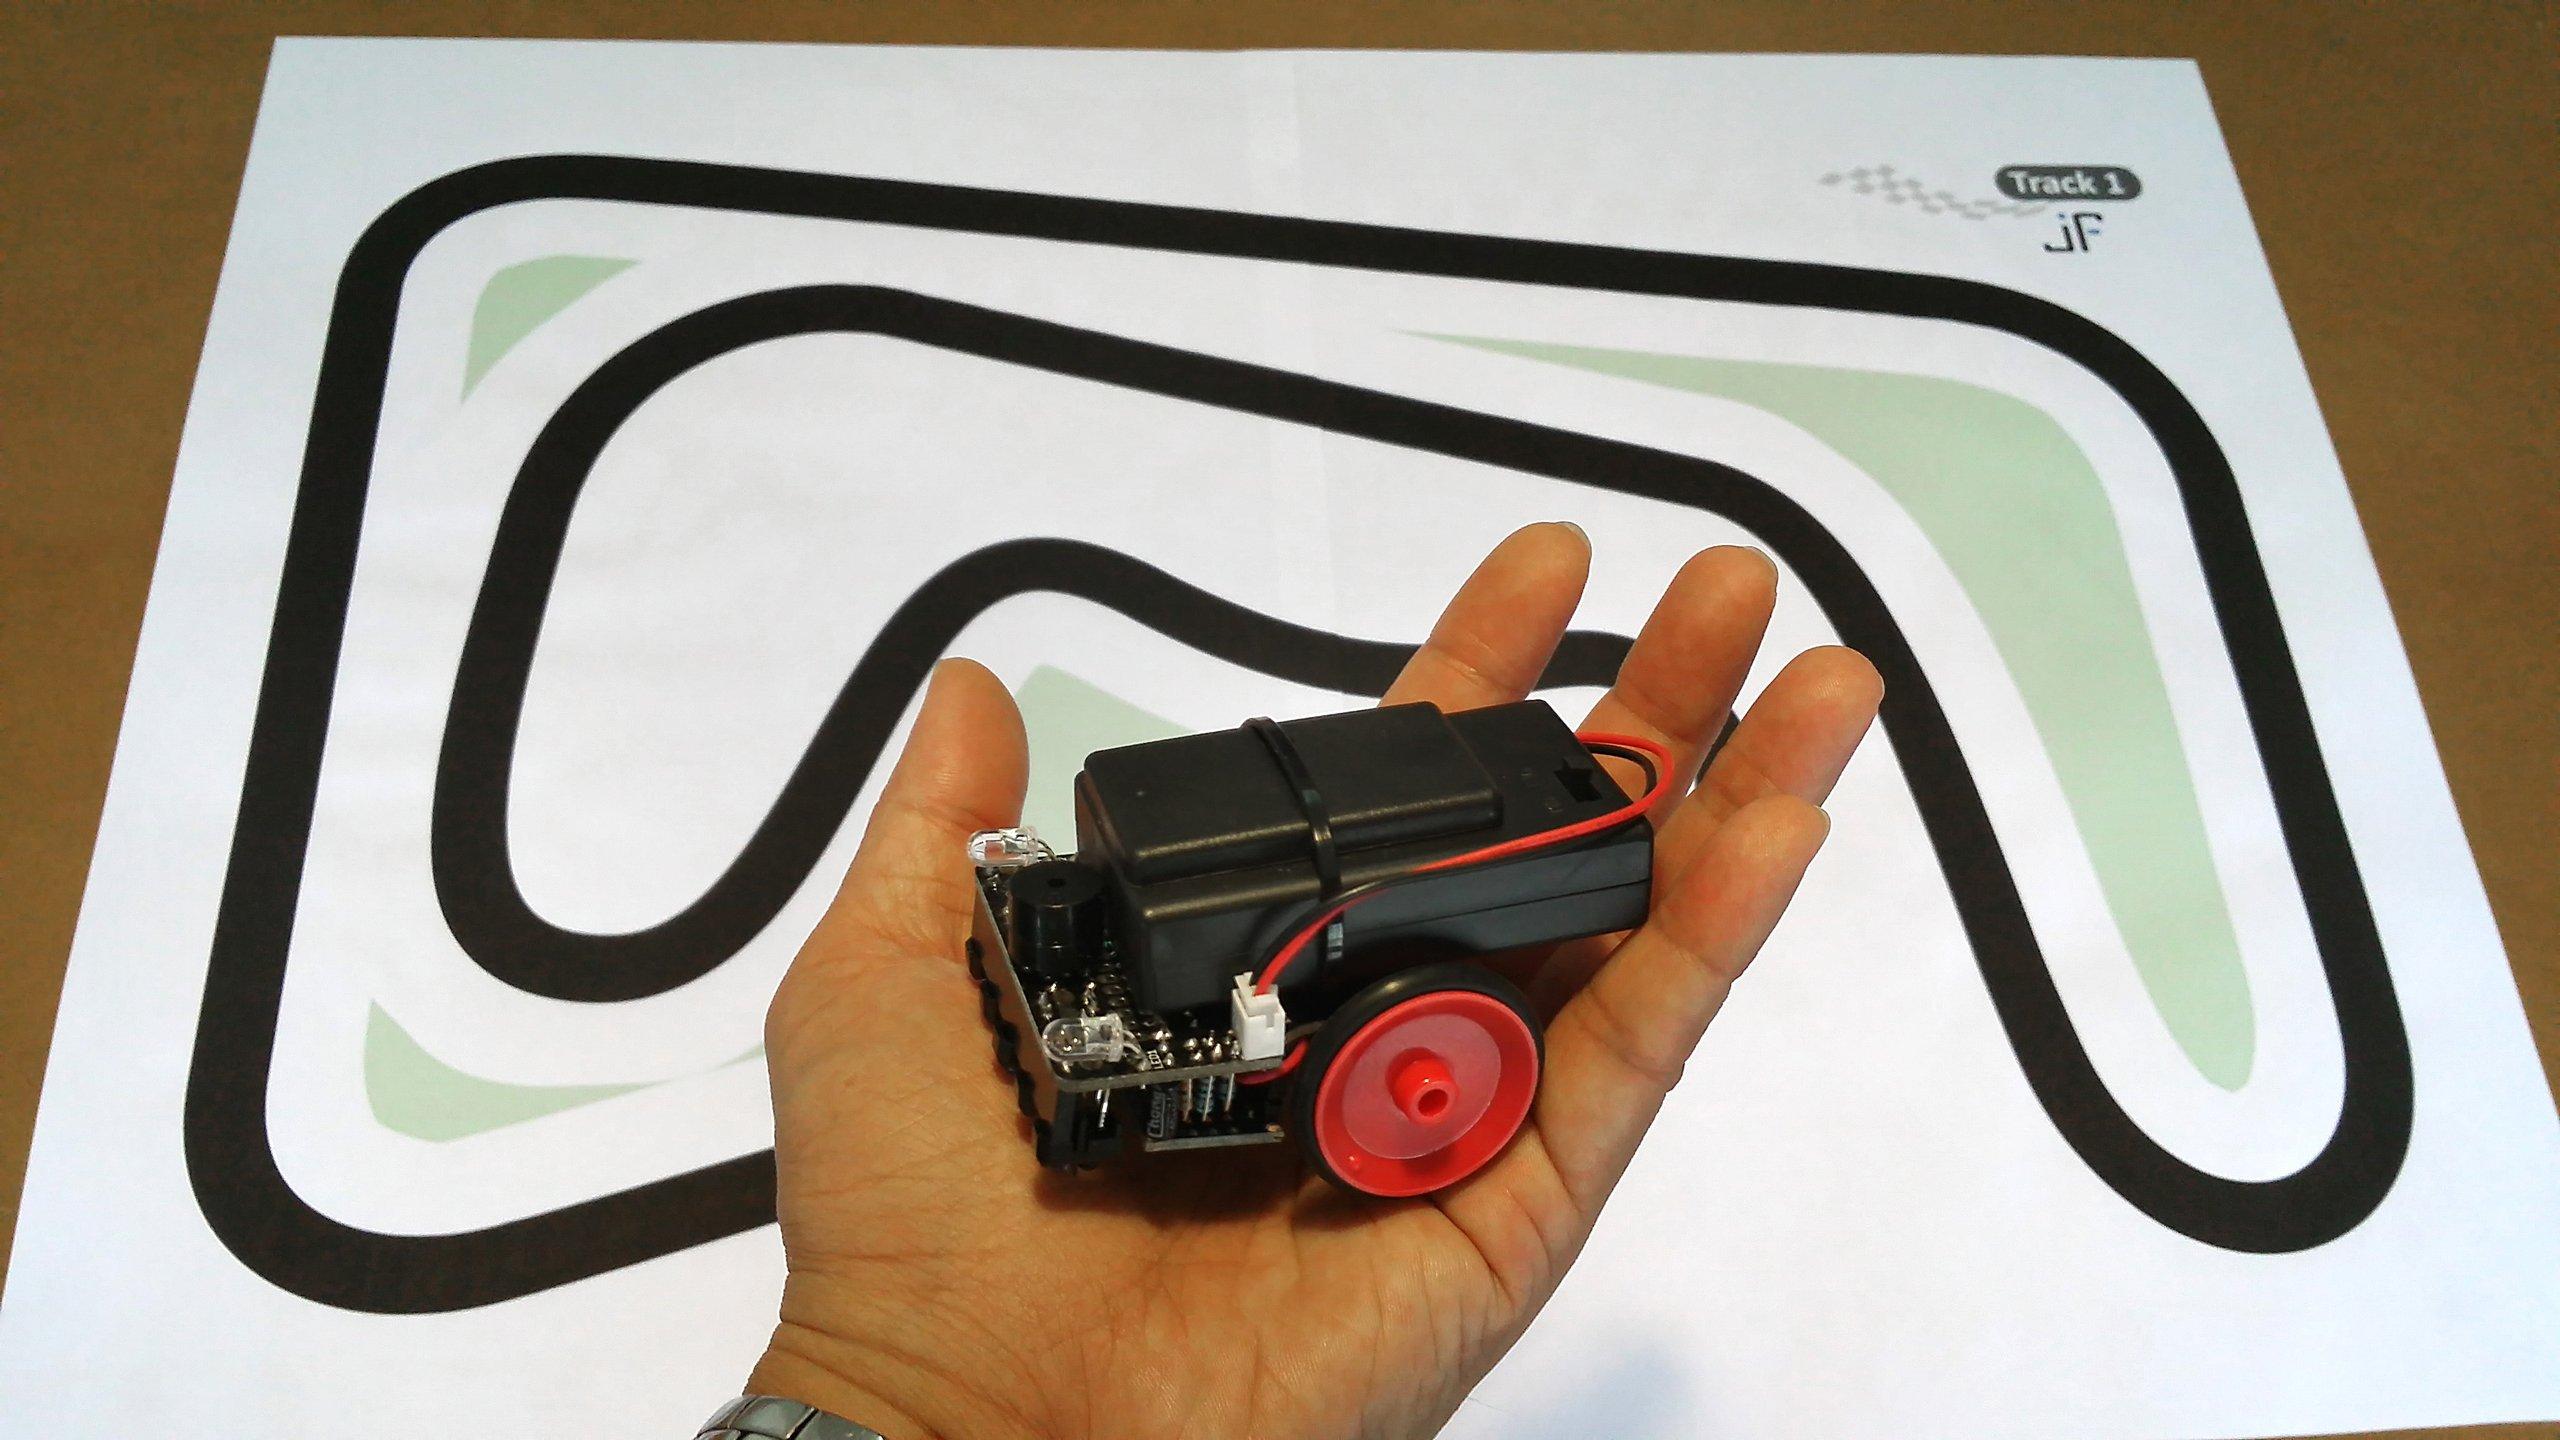 Jollibot arduino based line follower diy kit from nick